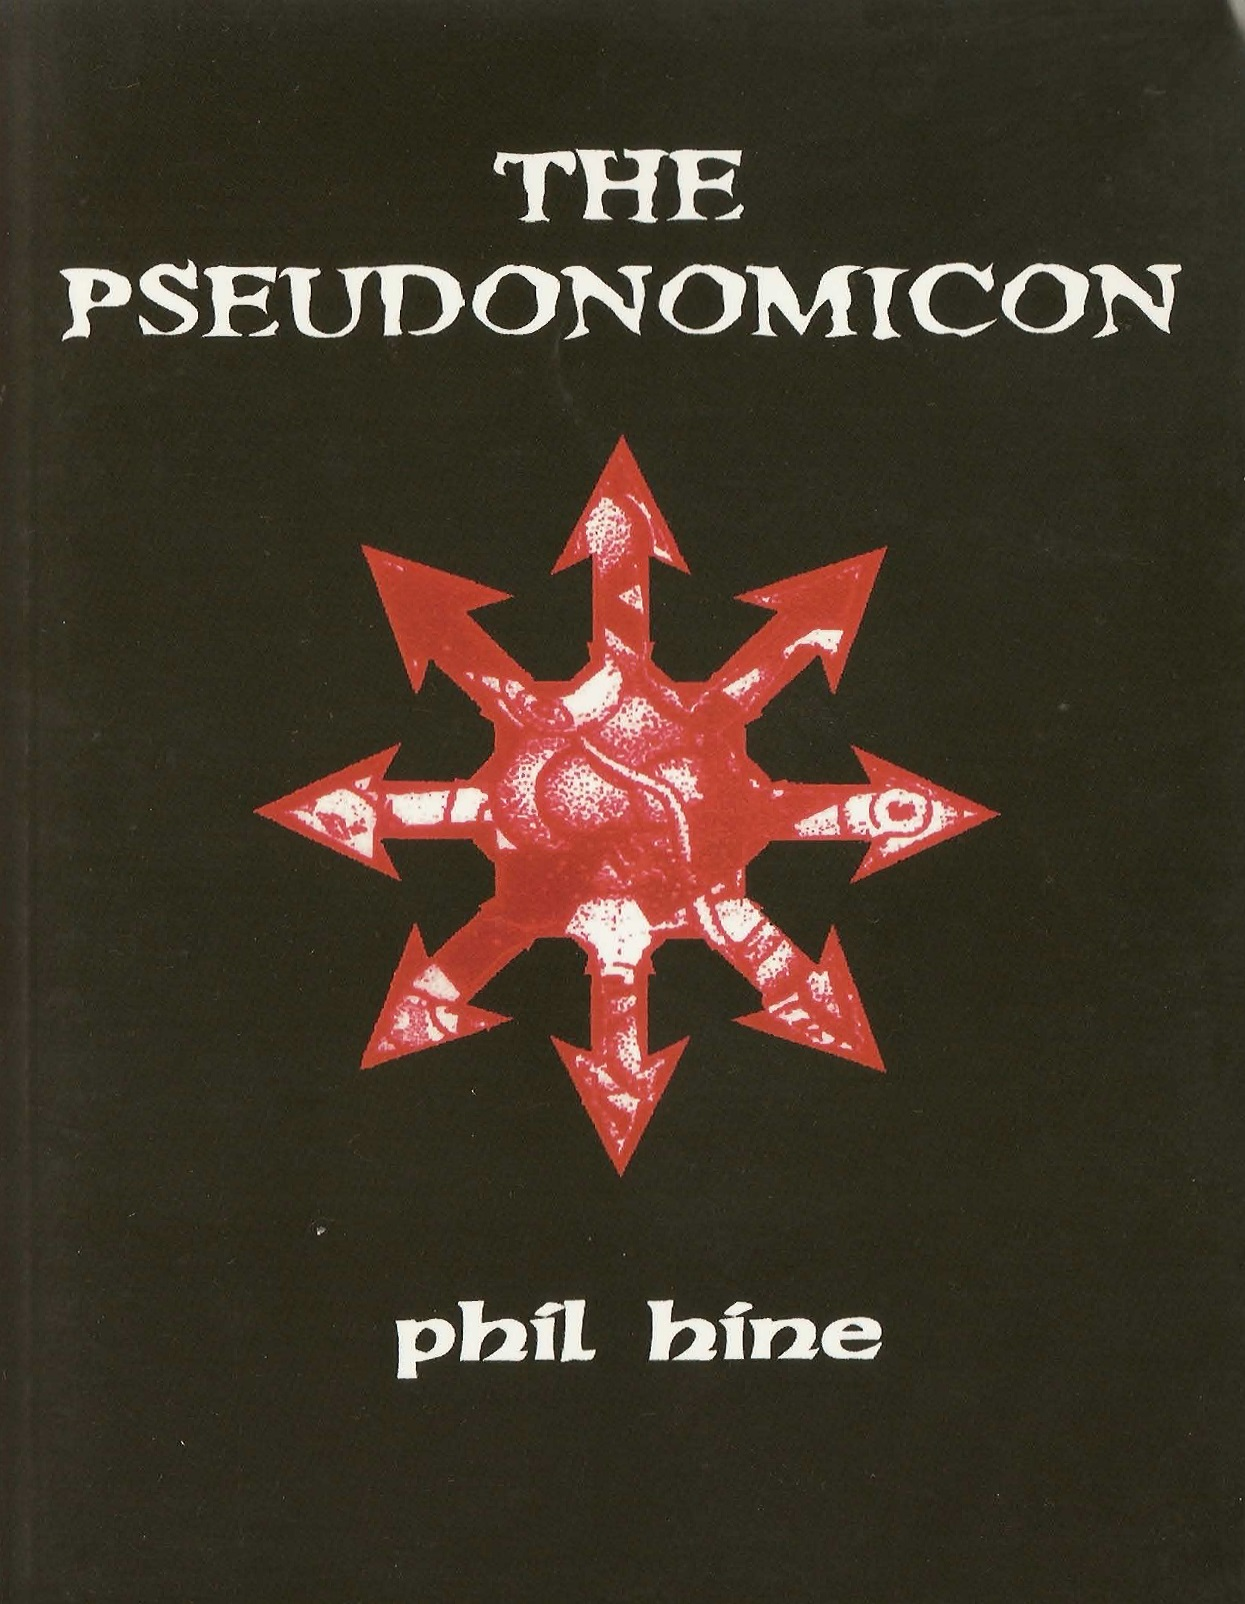 pseudonomicon phil hine.jpg